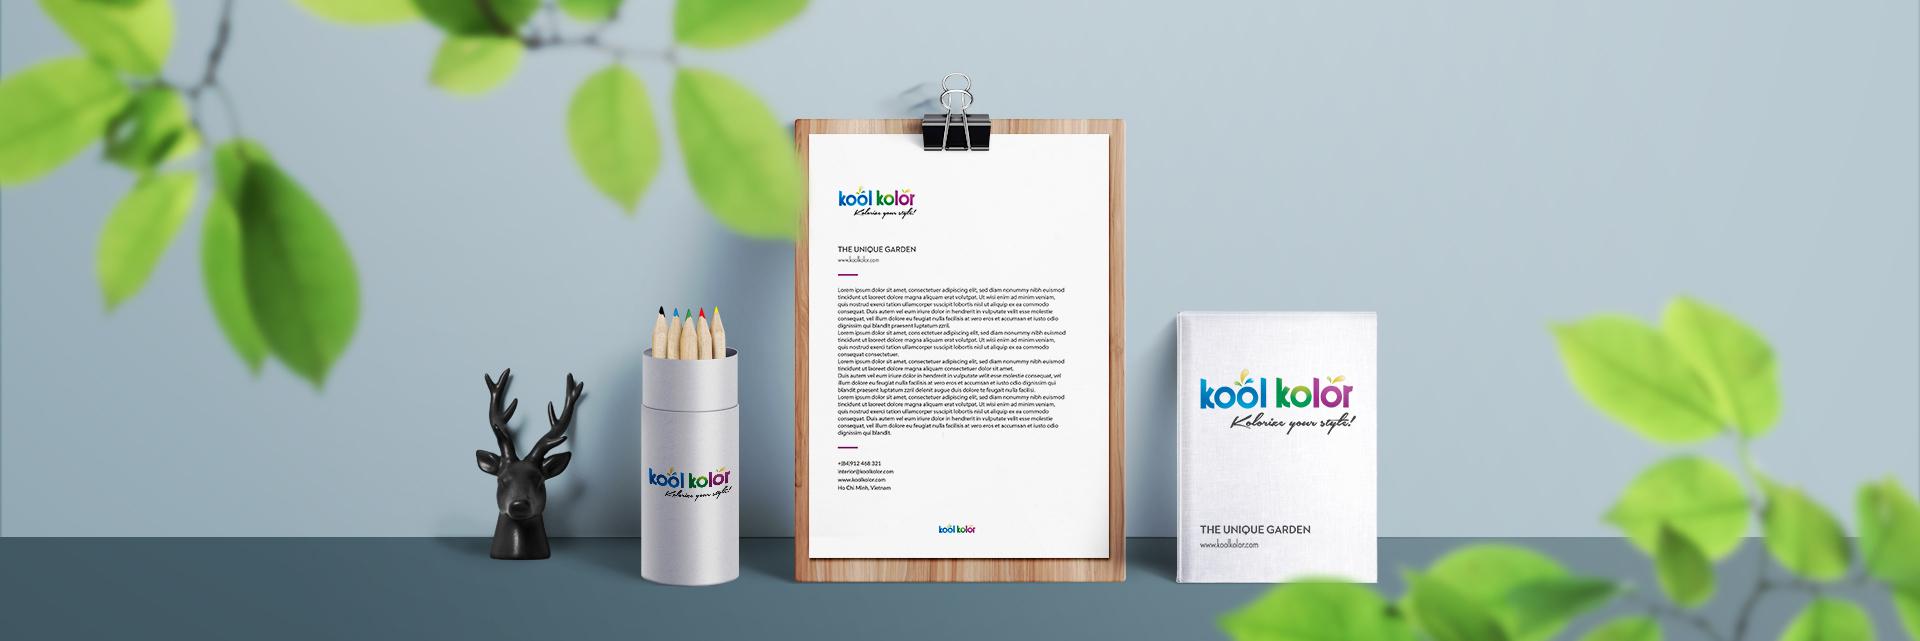 thiet-ke-logo-re-dep-kool-kolor-slide-2